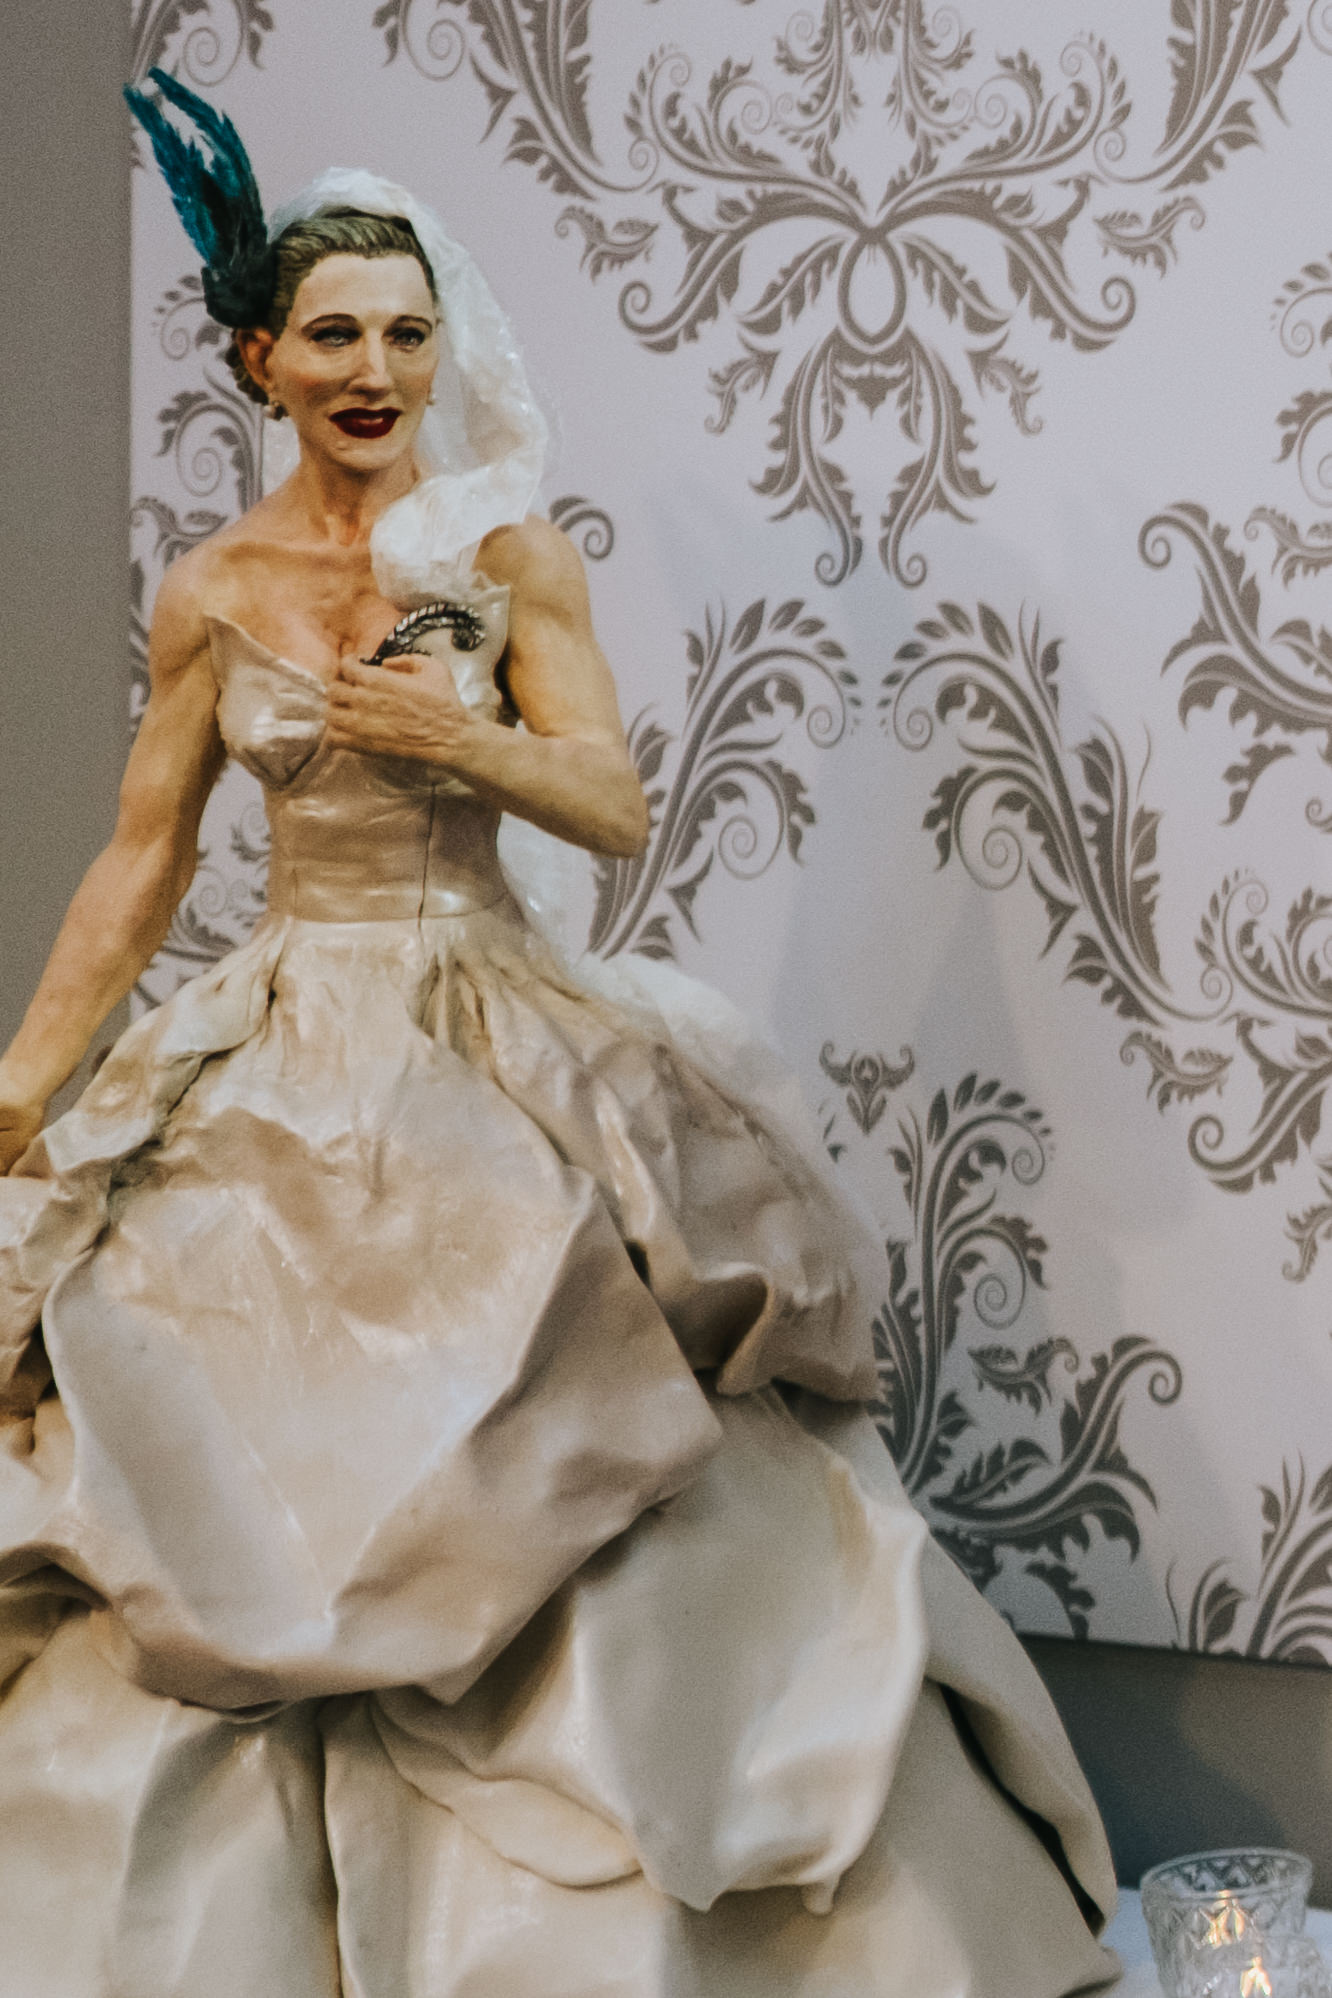 Wedding-Gowns-Daniel-Dieguez-1.jpg#asset:18204